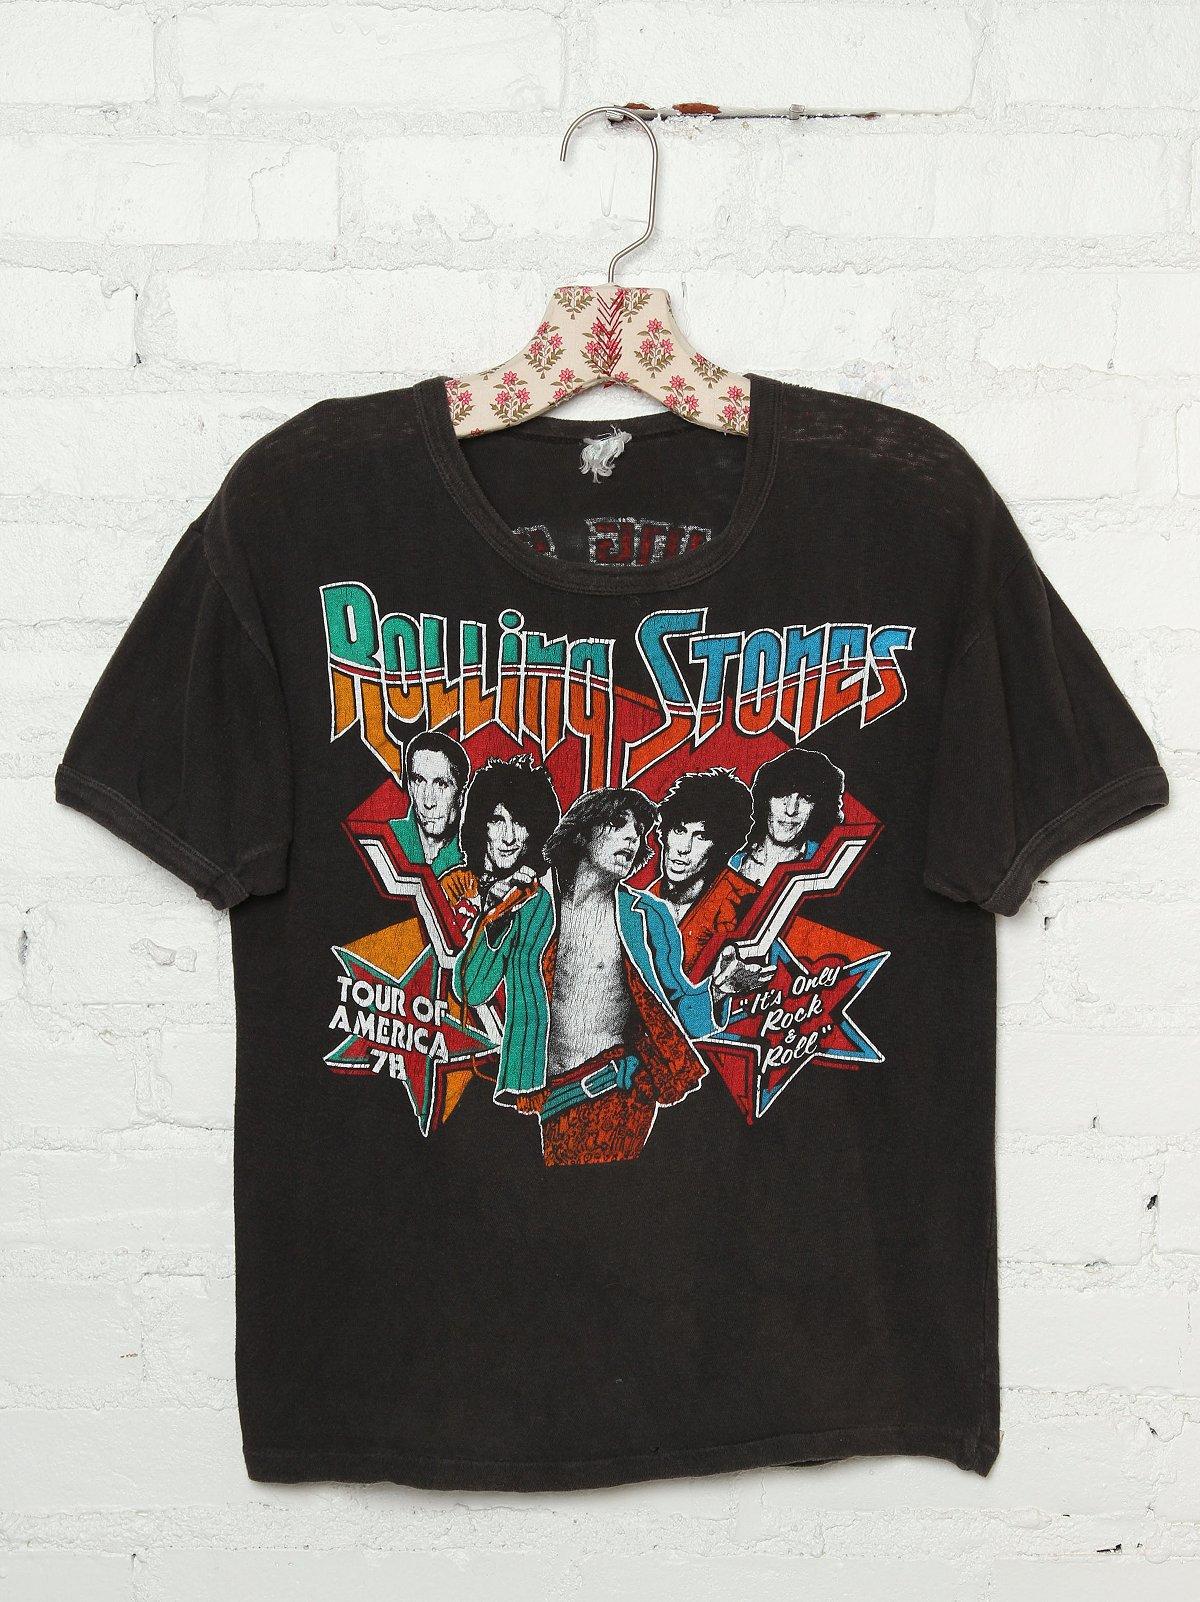 Vintage Rolling Stones Tour of America Tee